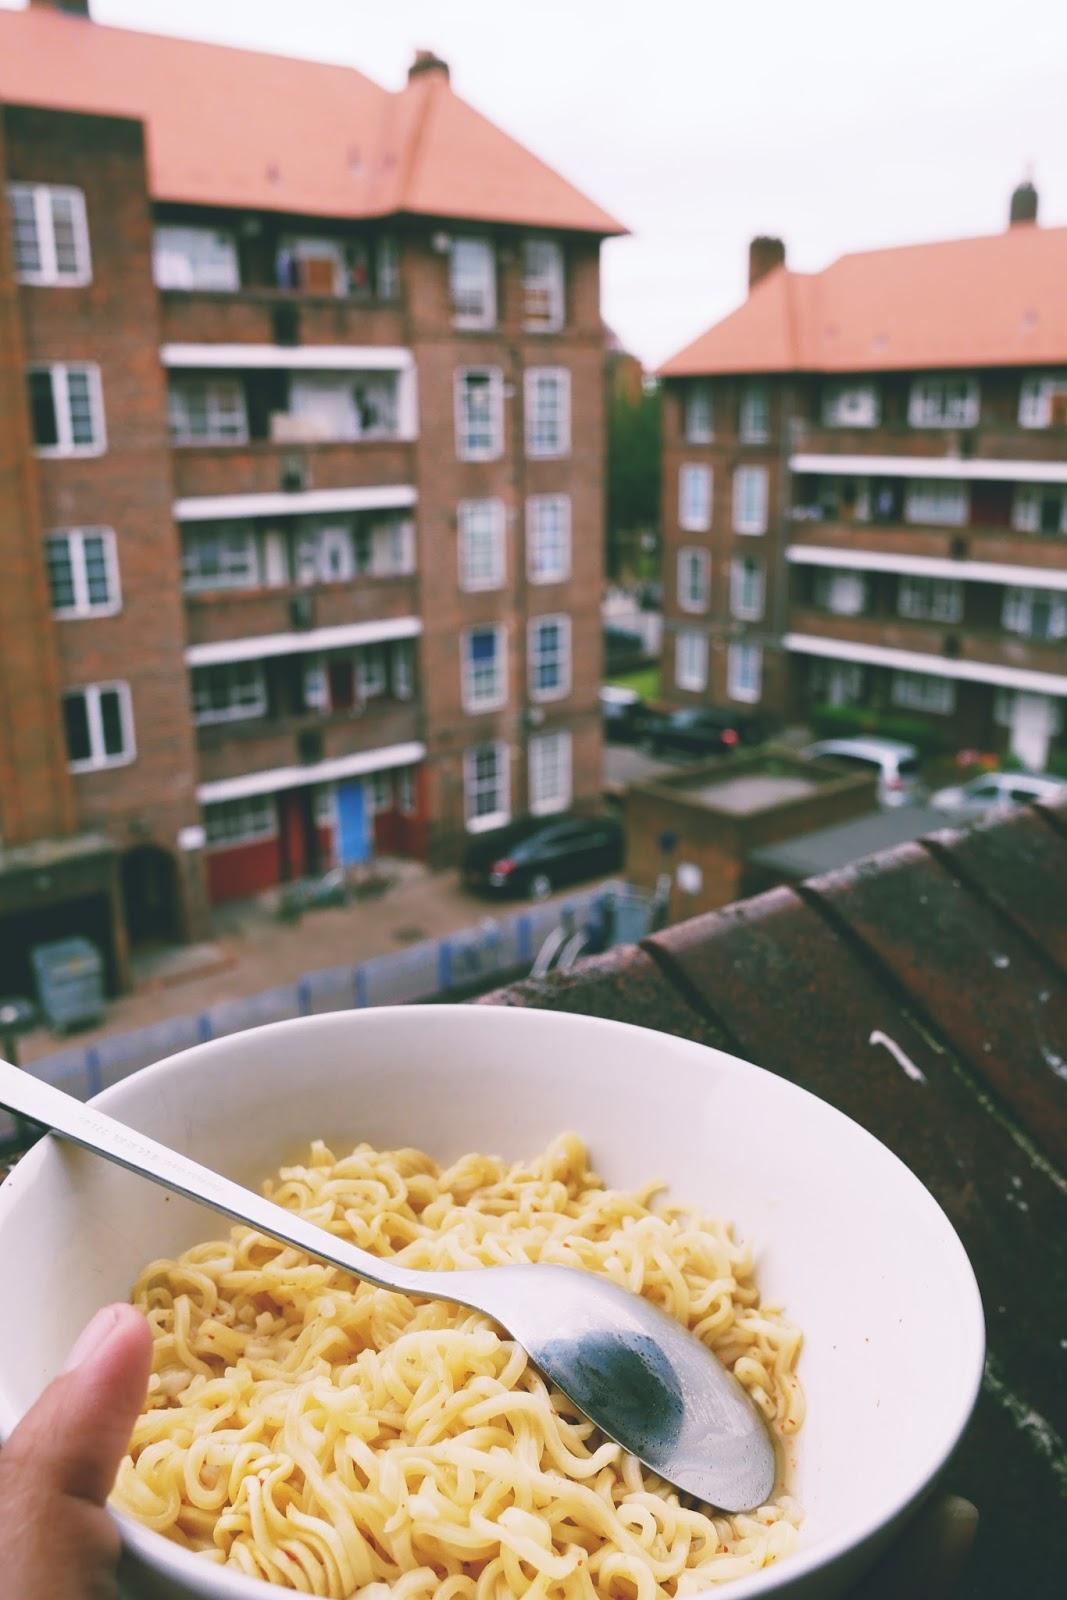 5 Hal yang Kamu Dapatkan Ketika Menginap di Dormitory